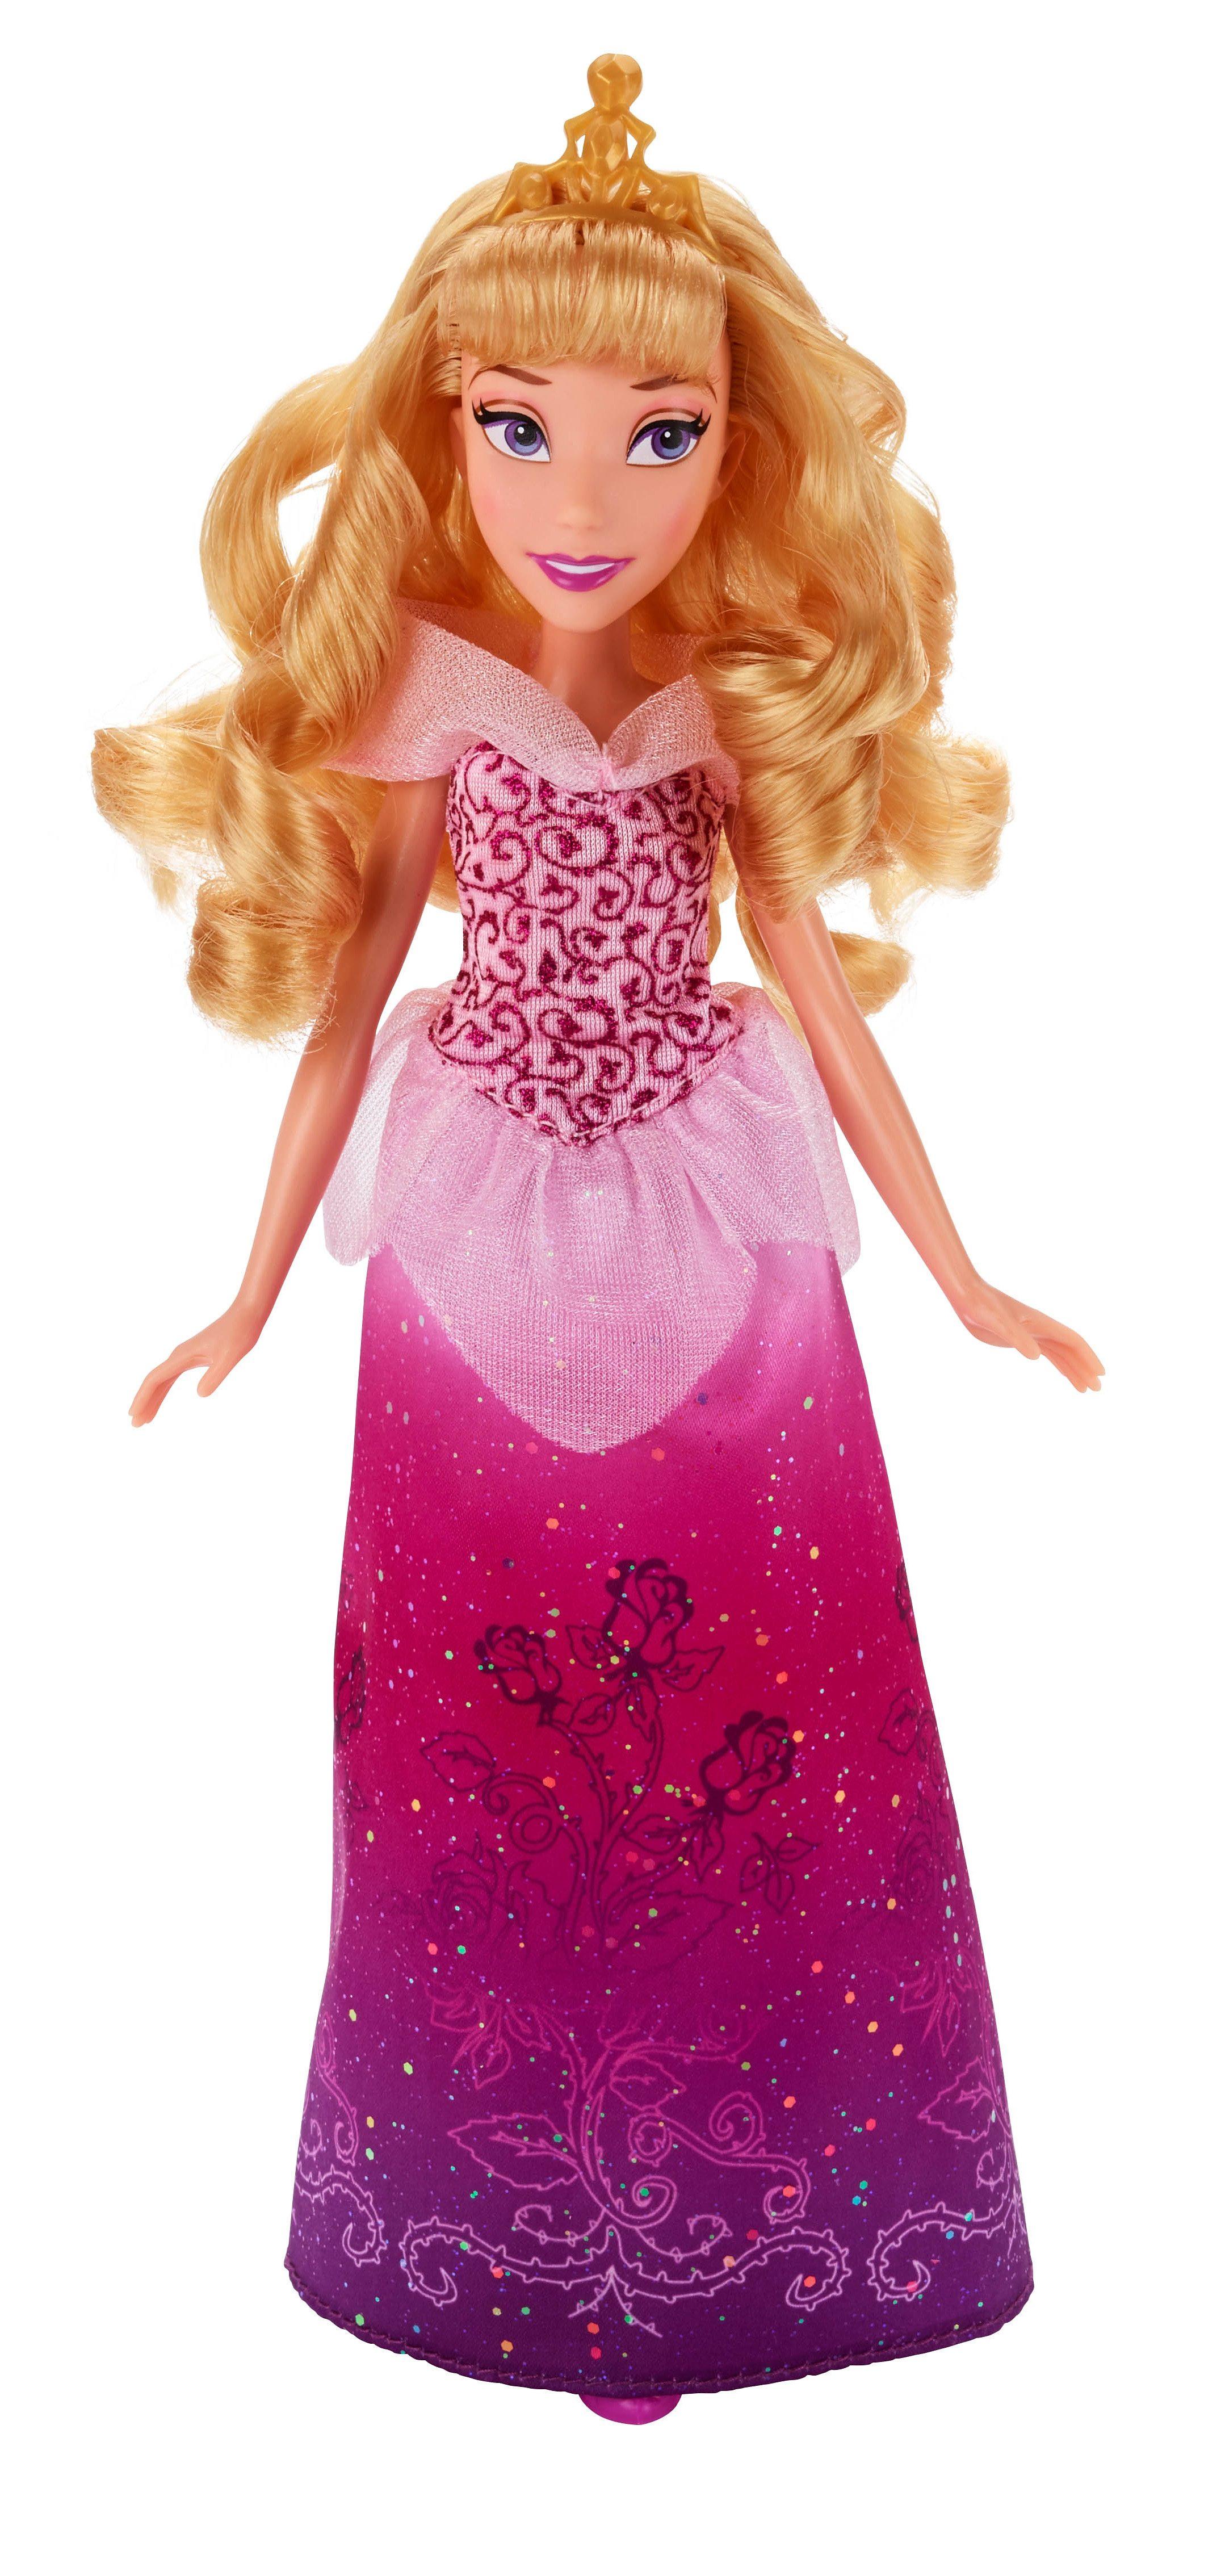 Hasbro Puppe 27 cm, »Disney Princess - Schimmerglanz Aurora«